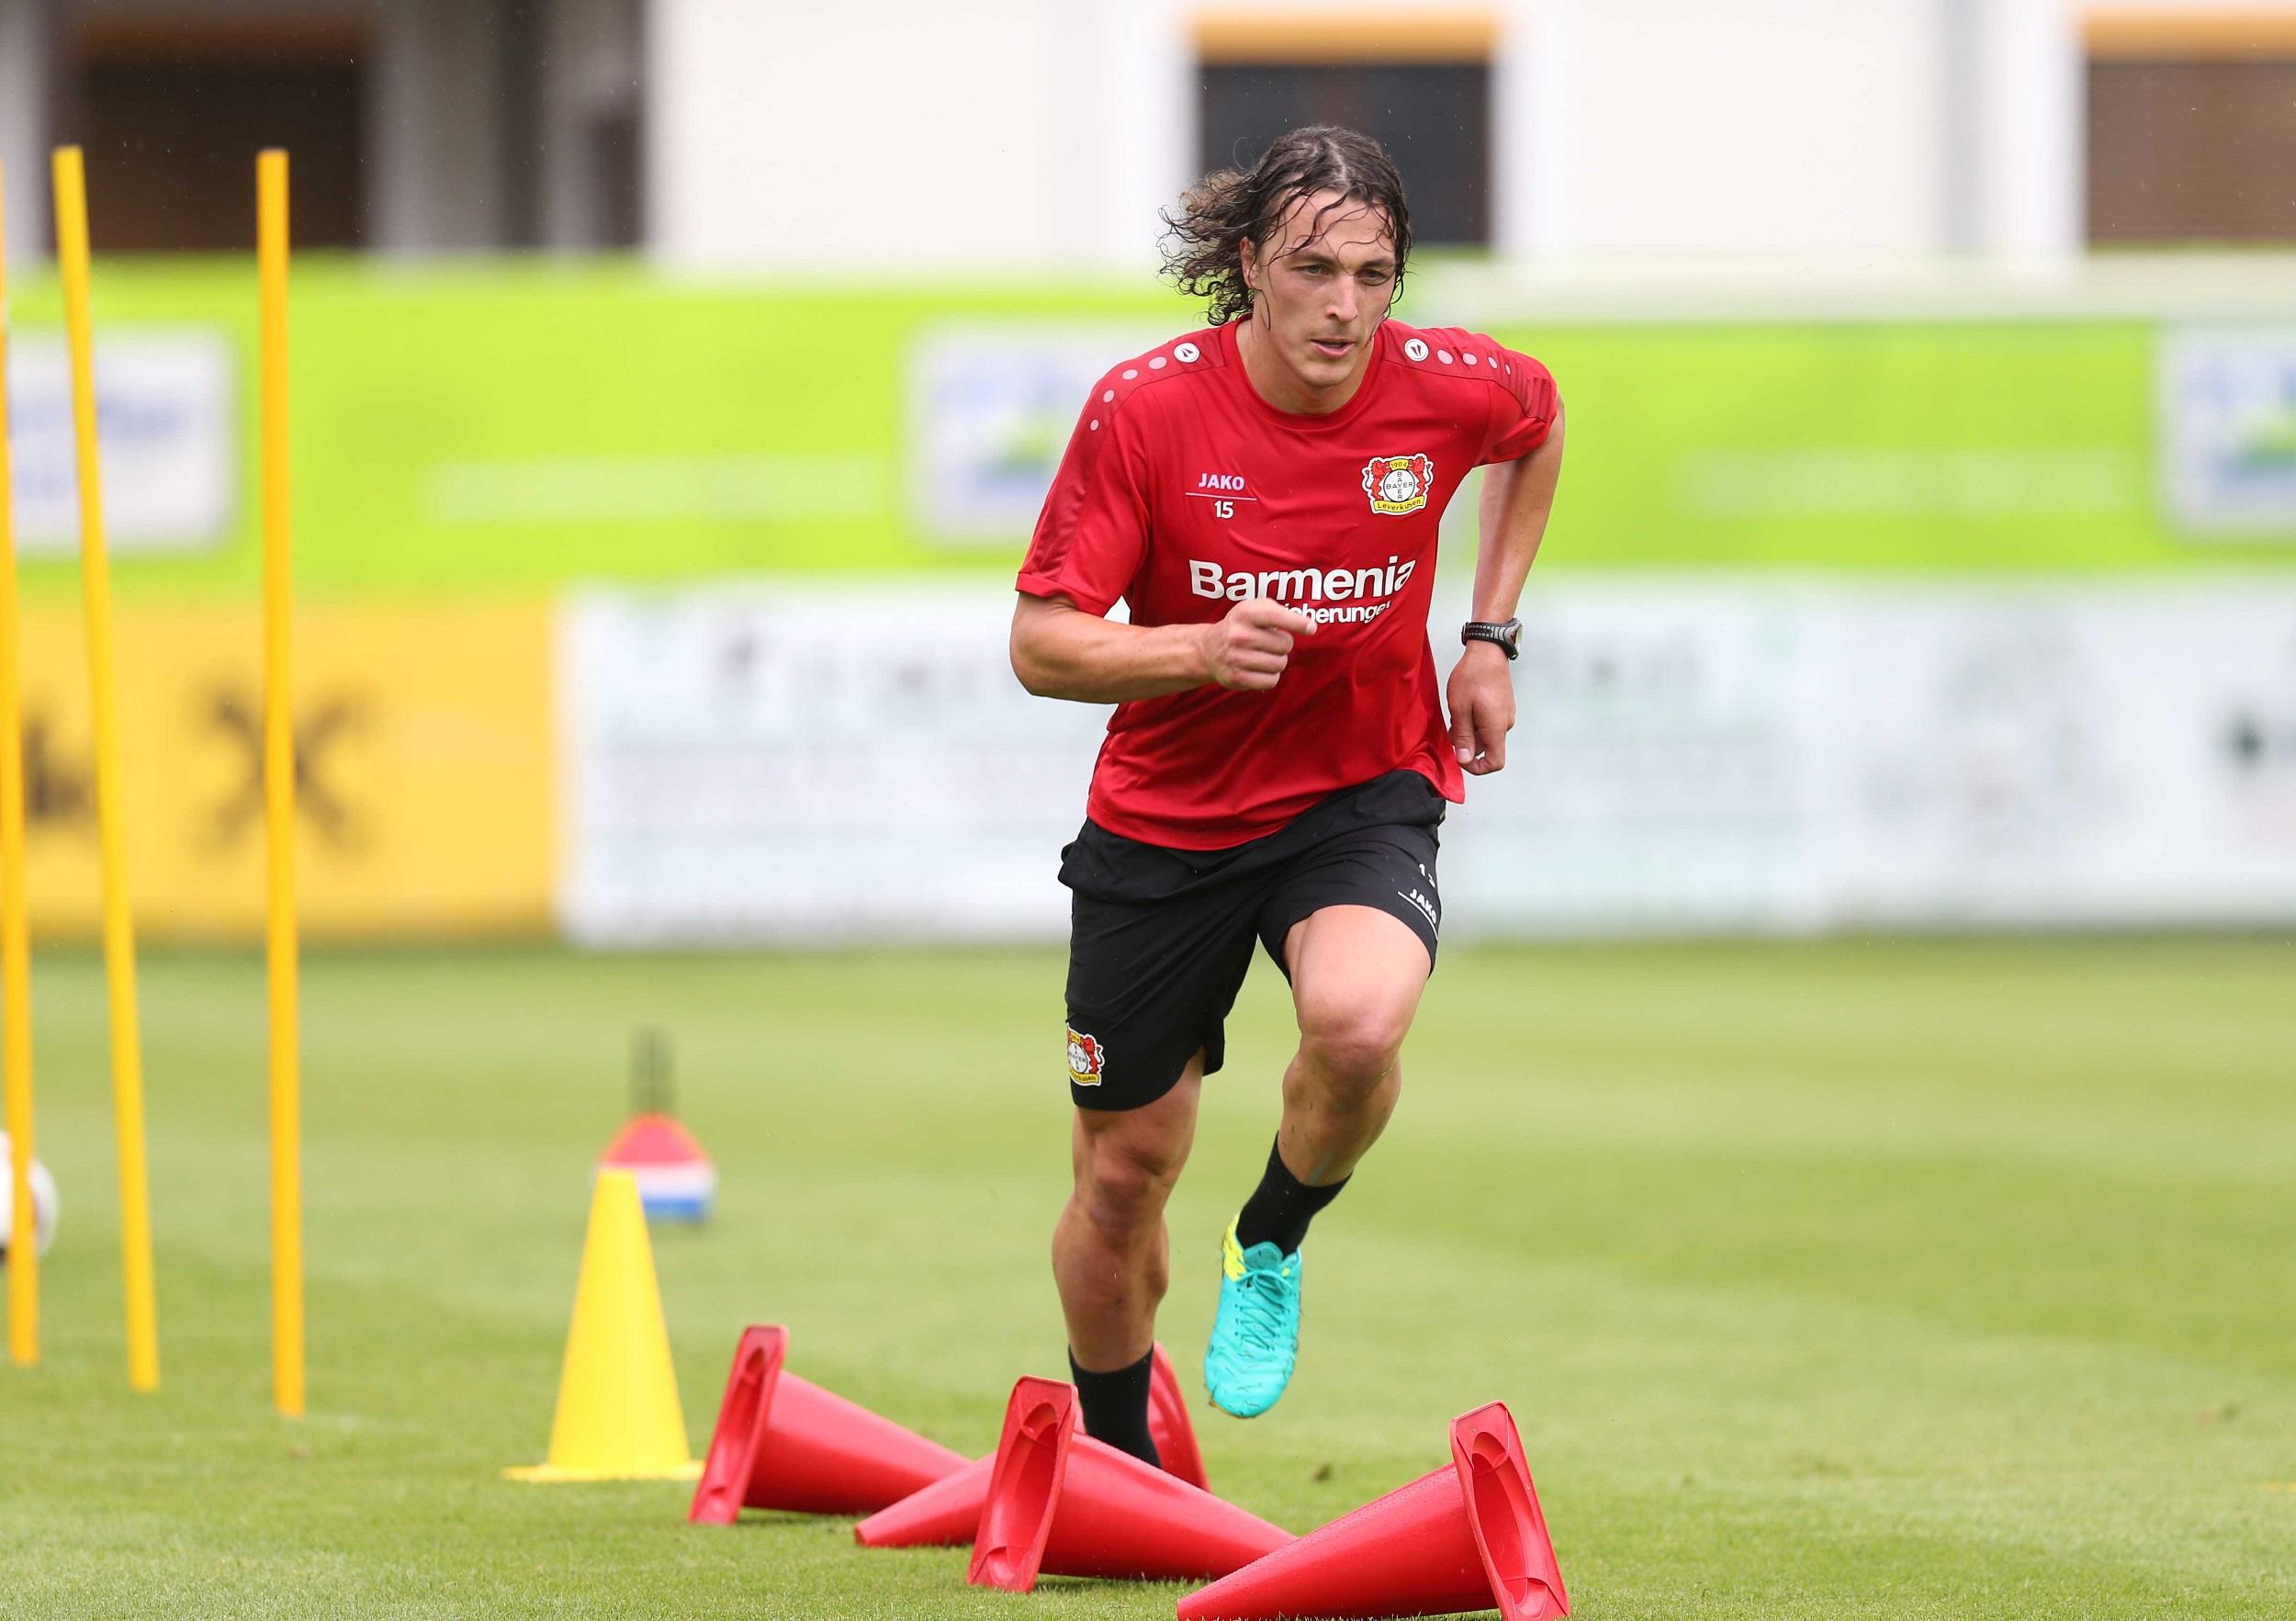 Leverkusen fast track Baumgartlinger for return to action